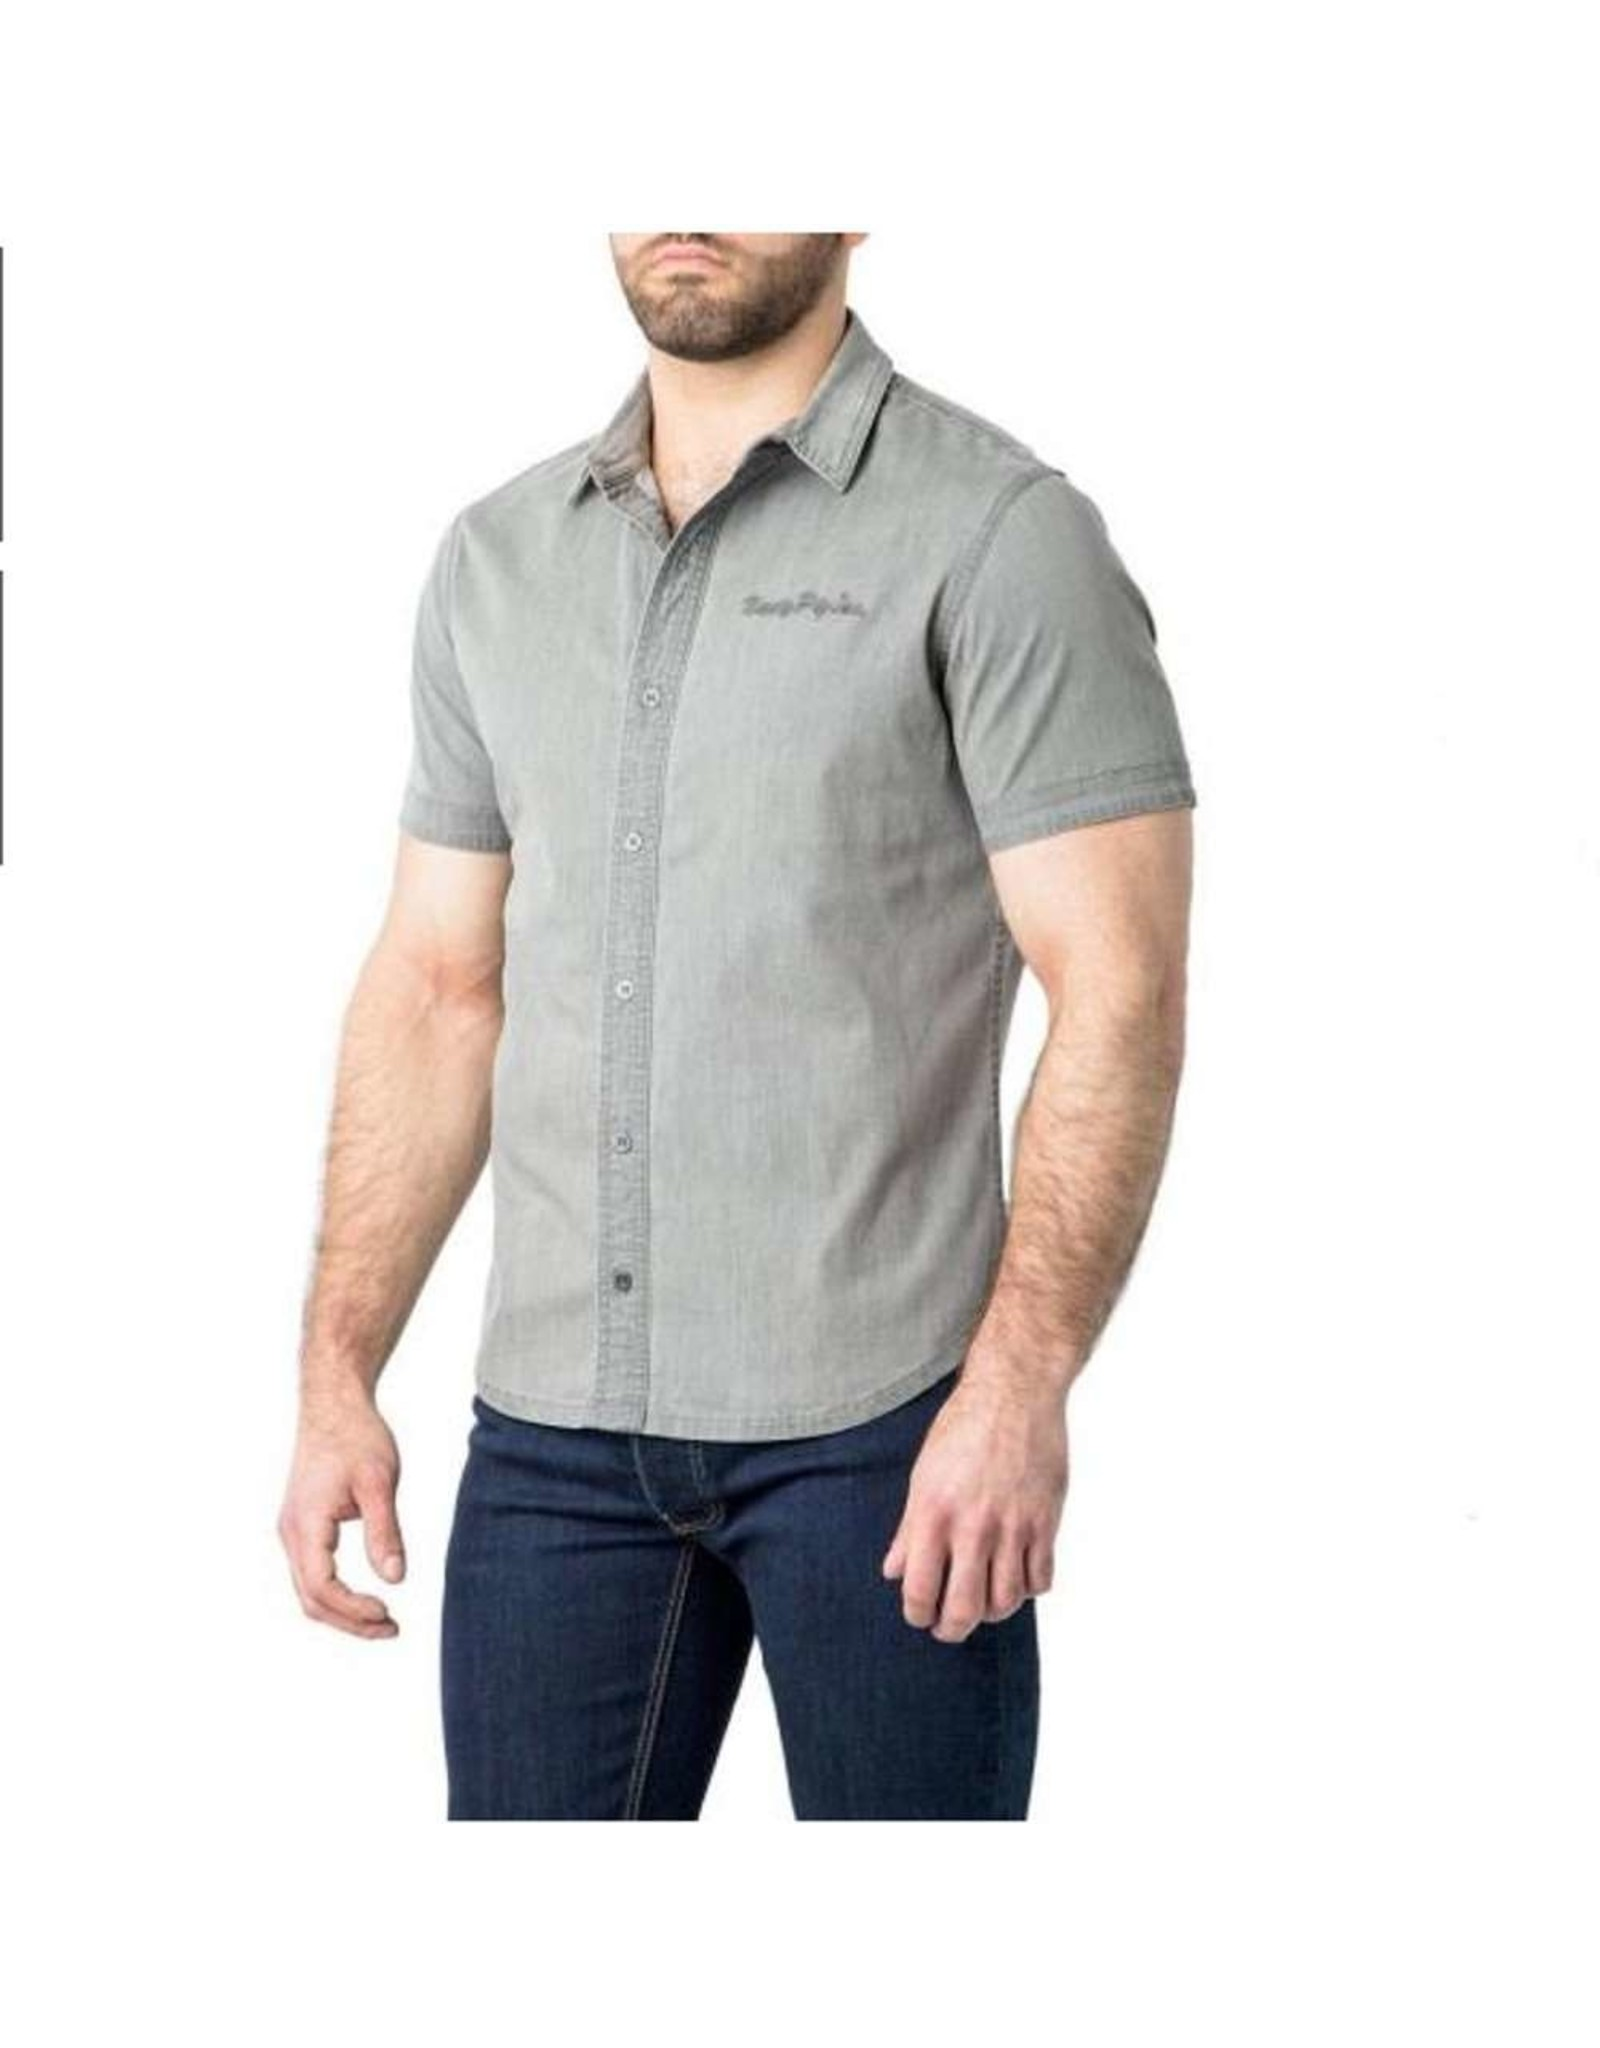 Nasty Pig Nasty Pig Industry Short Sleeve Shirt